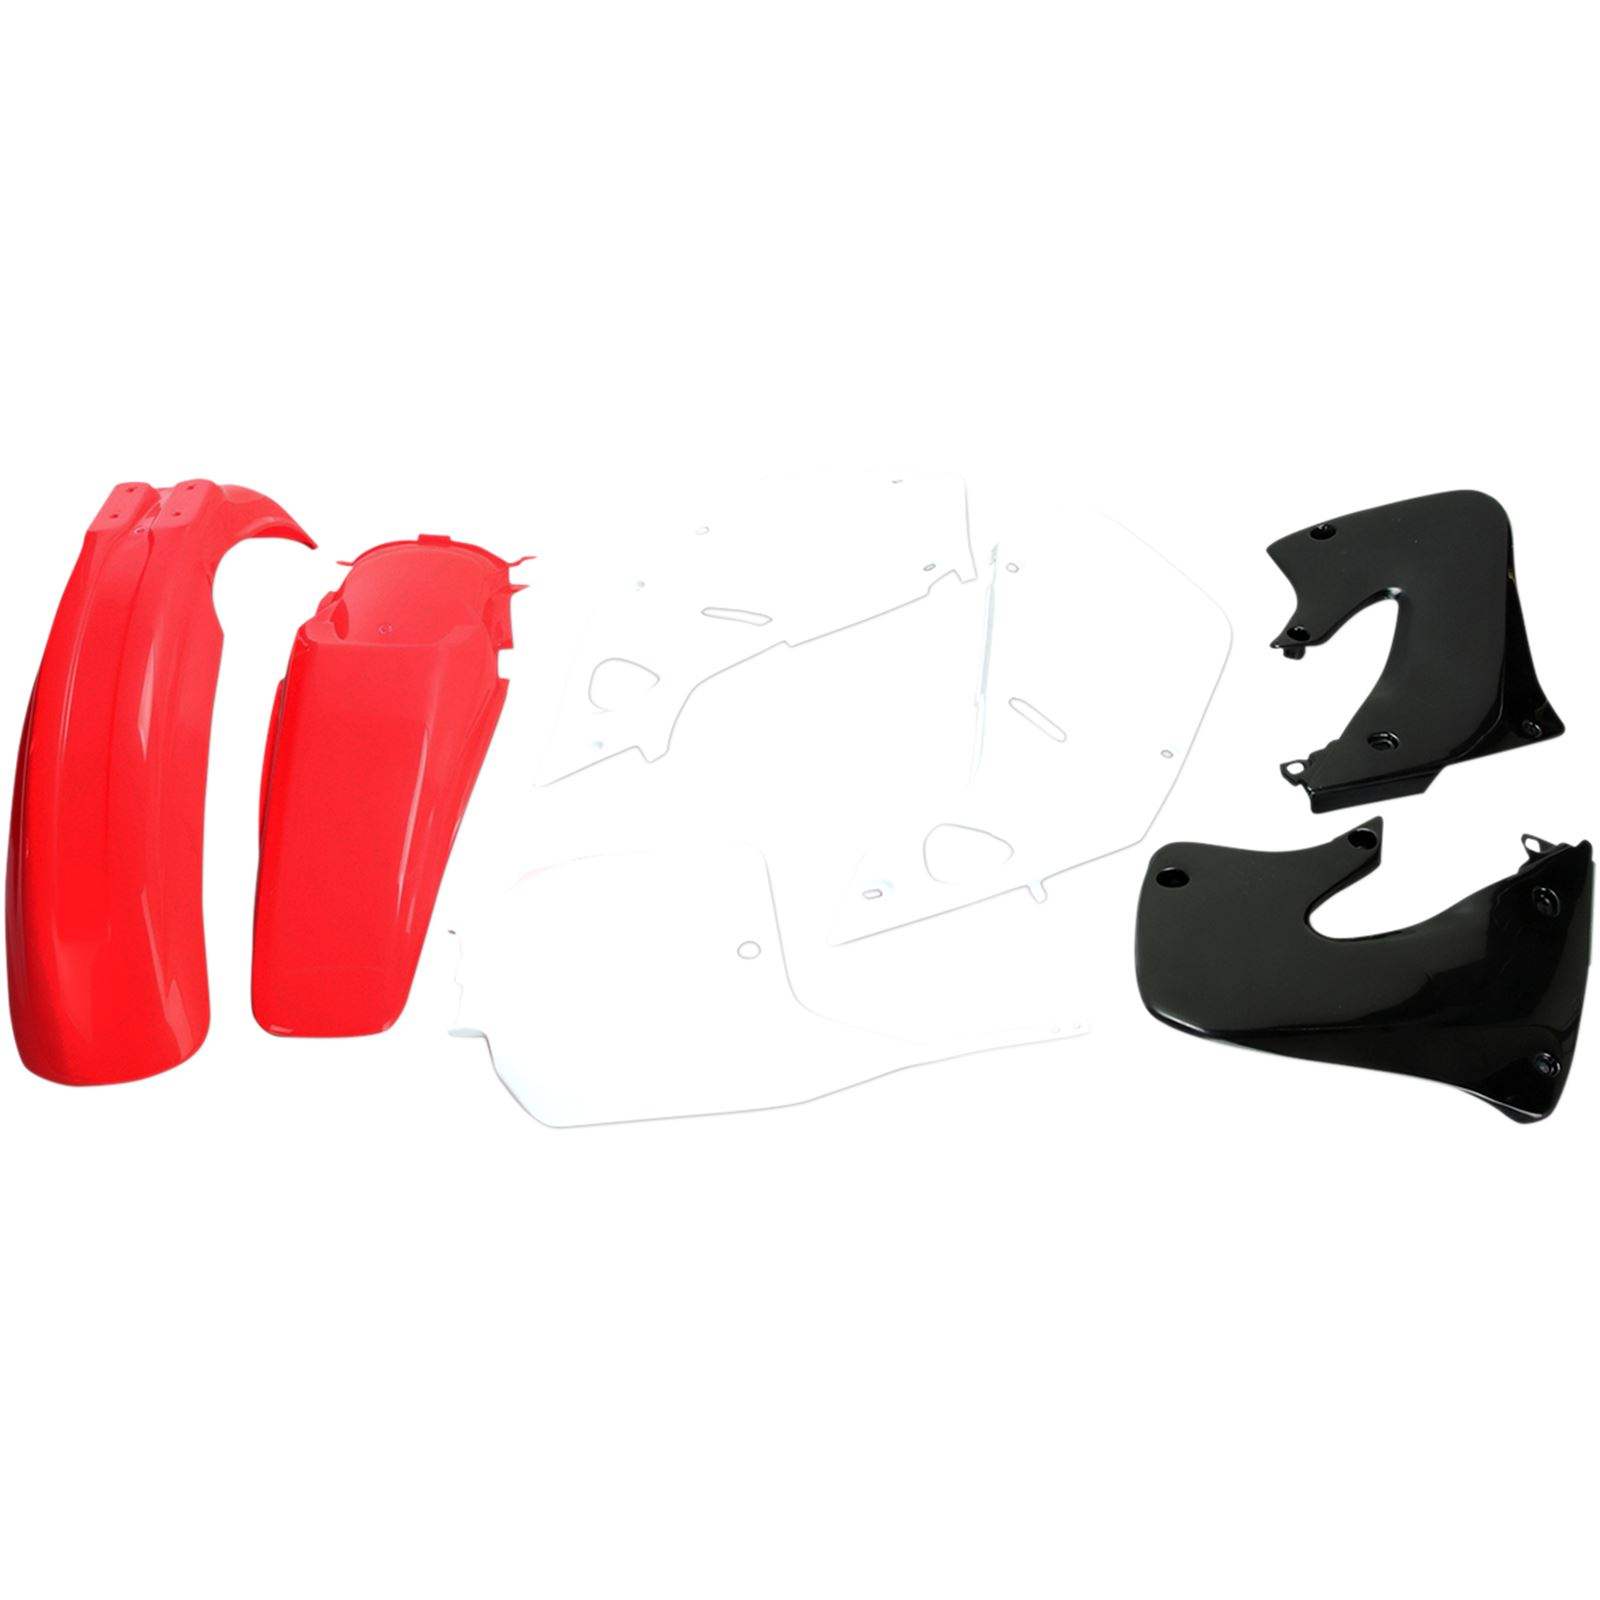 UFO Plastics Replacement Body Kit - OE White/Red/Black - '98-'99 CR125R/250R